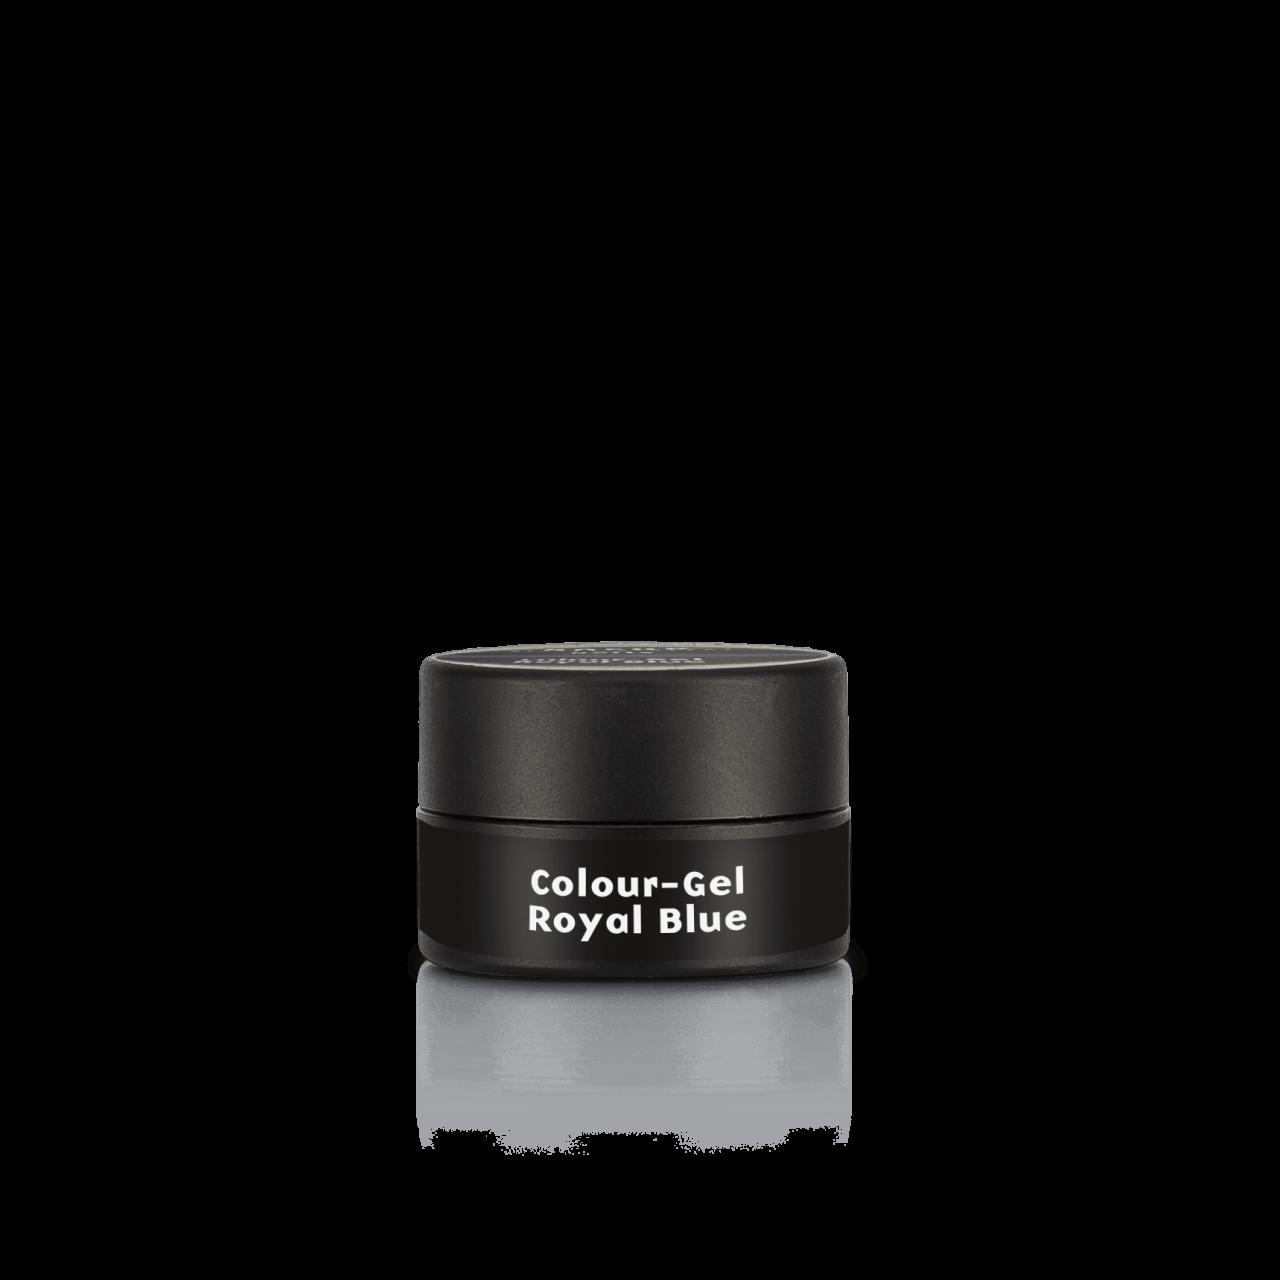 Colour-Gel Royal Blue 5 ml